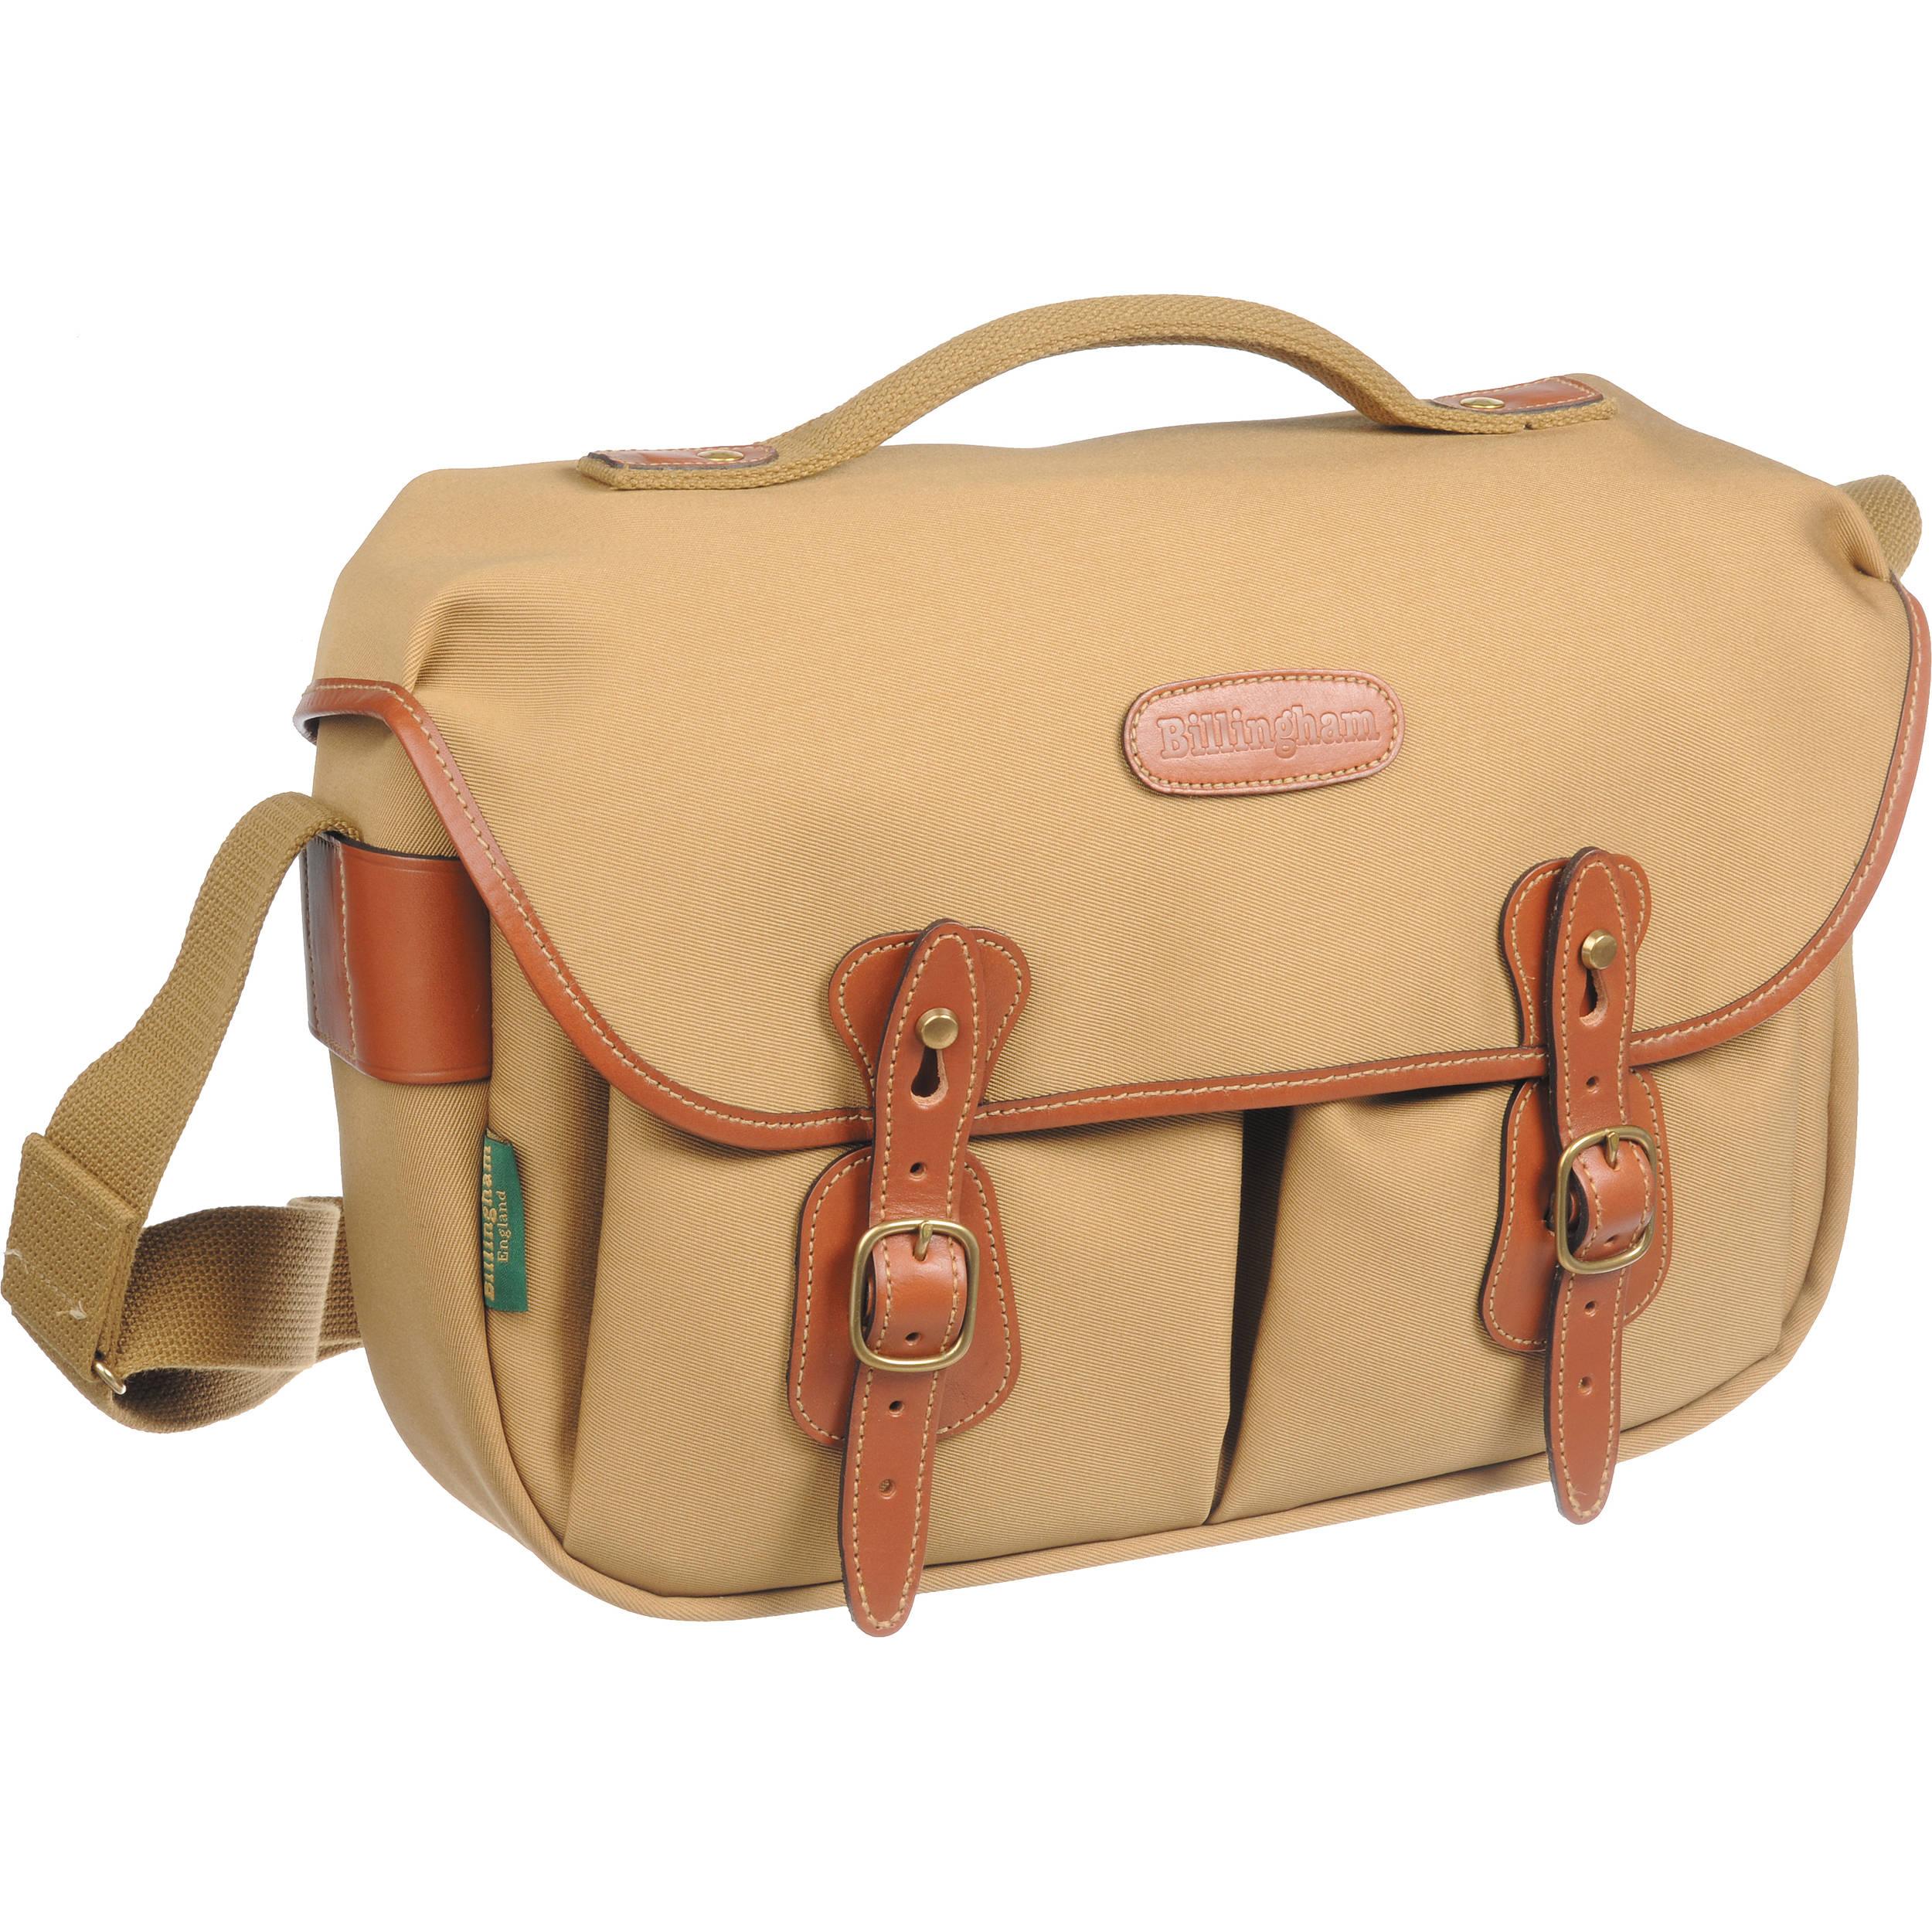 365b80df2 Billingham Hadley Pro Shoulder Bag BI 505233-70 B&H Photo